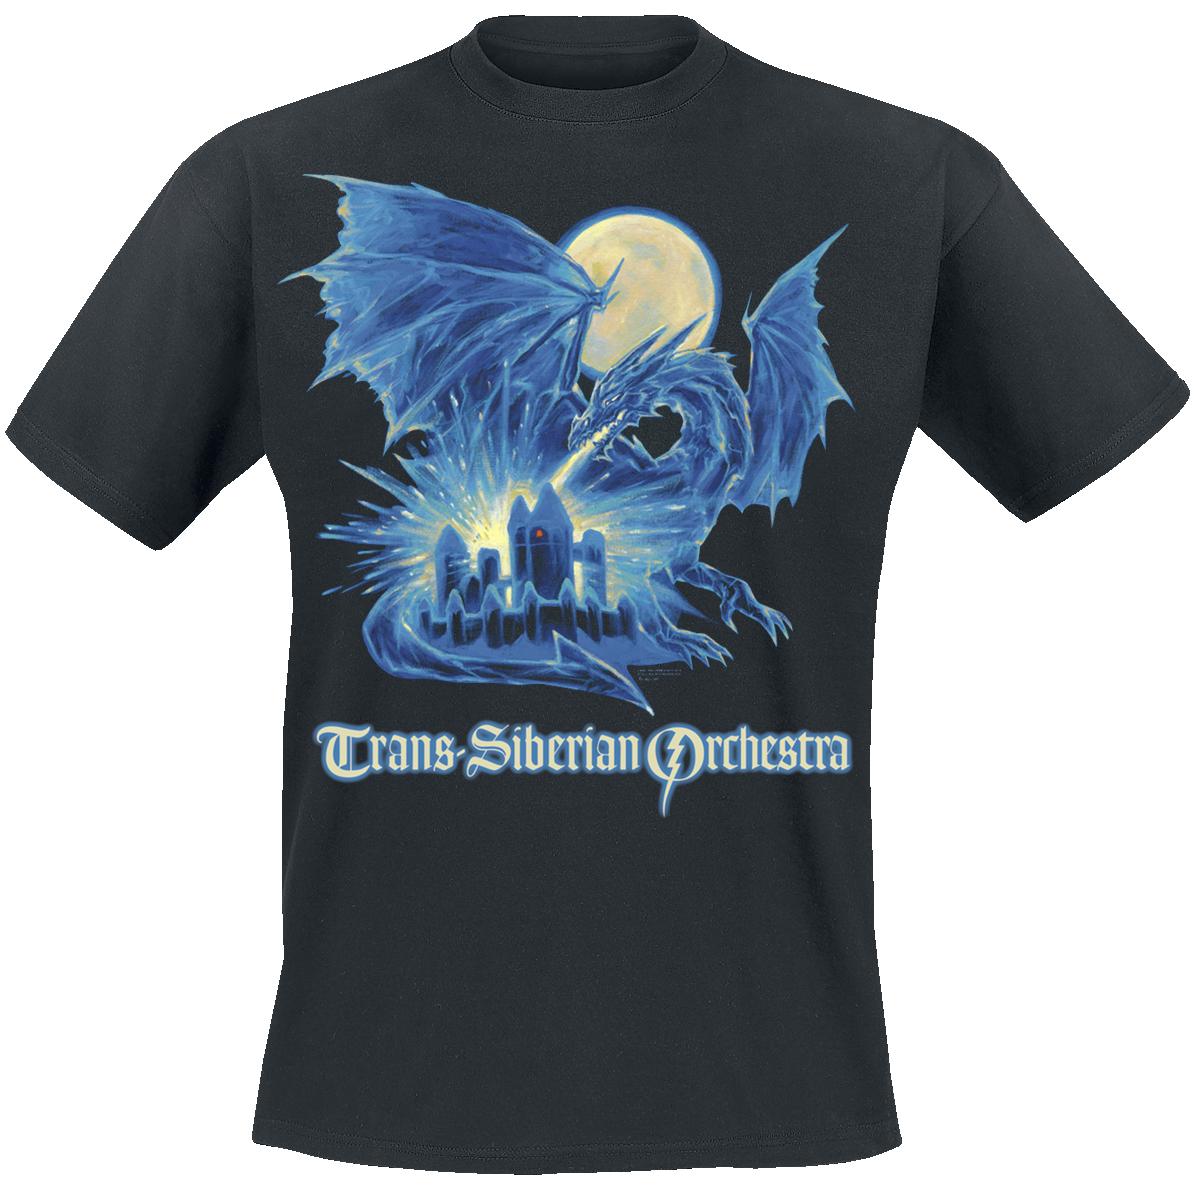 Trans-Siberian Orchestra - Ice Dragon - T-Shirt - black image